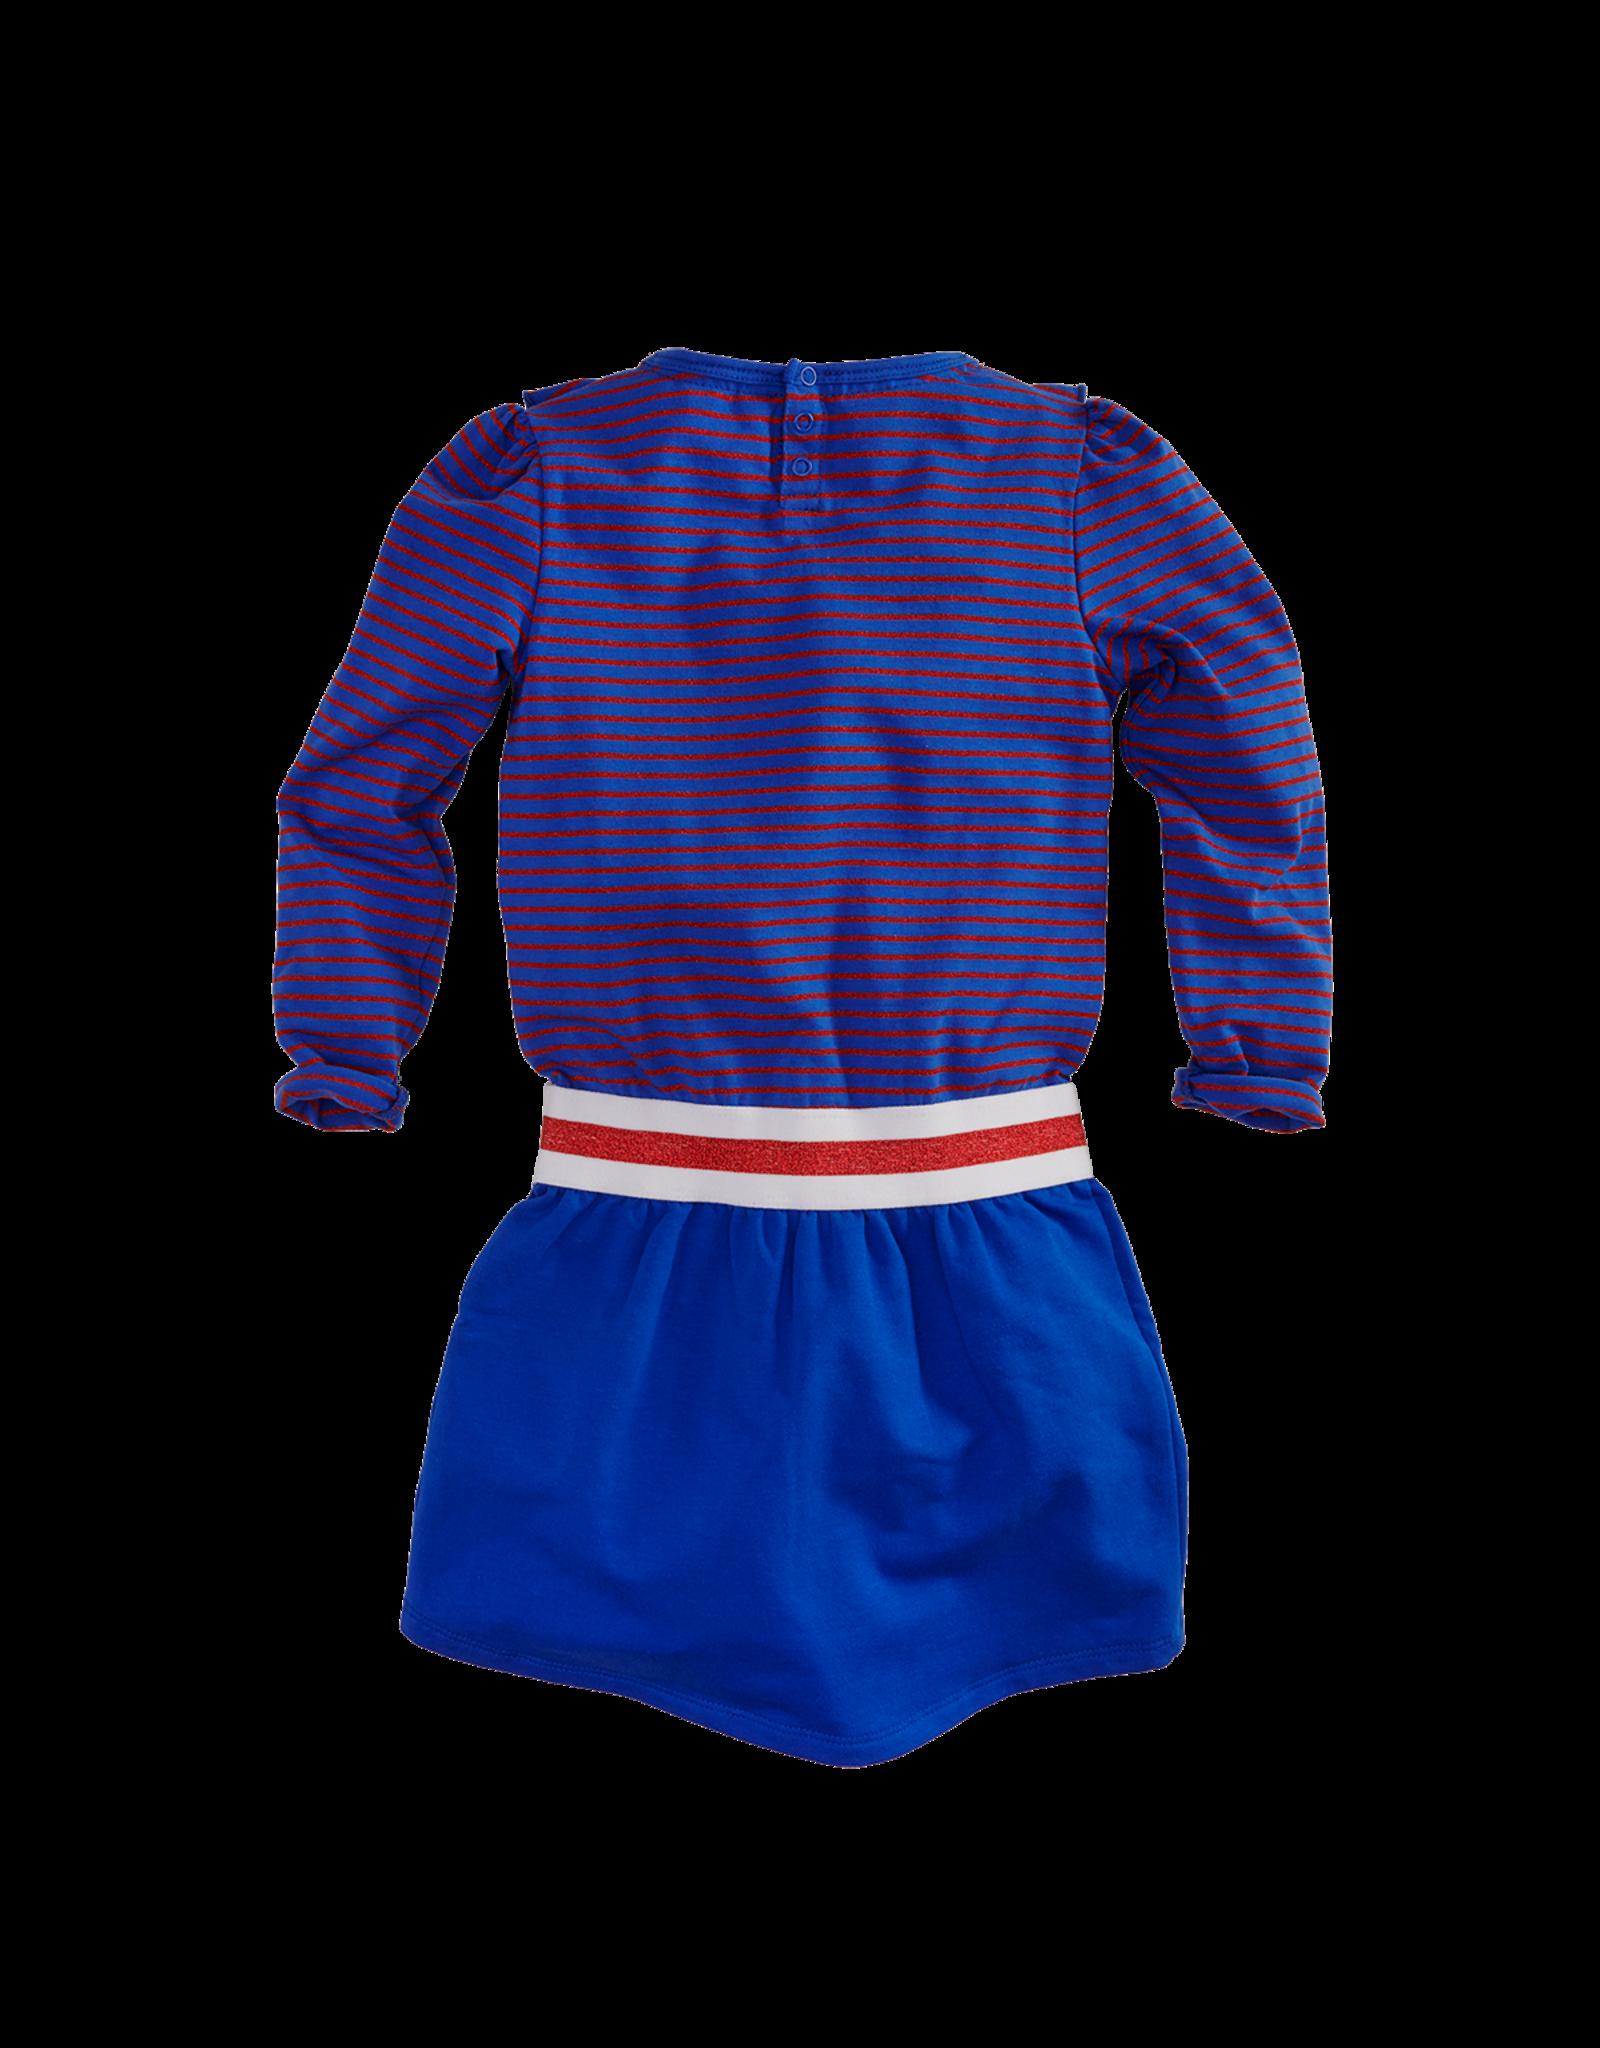 Z8 Bibi Brilliant blue/Stripes